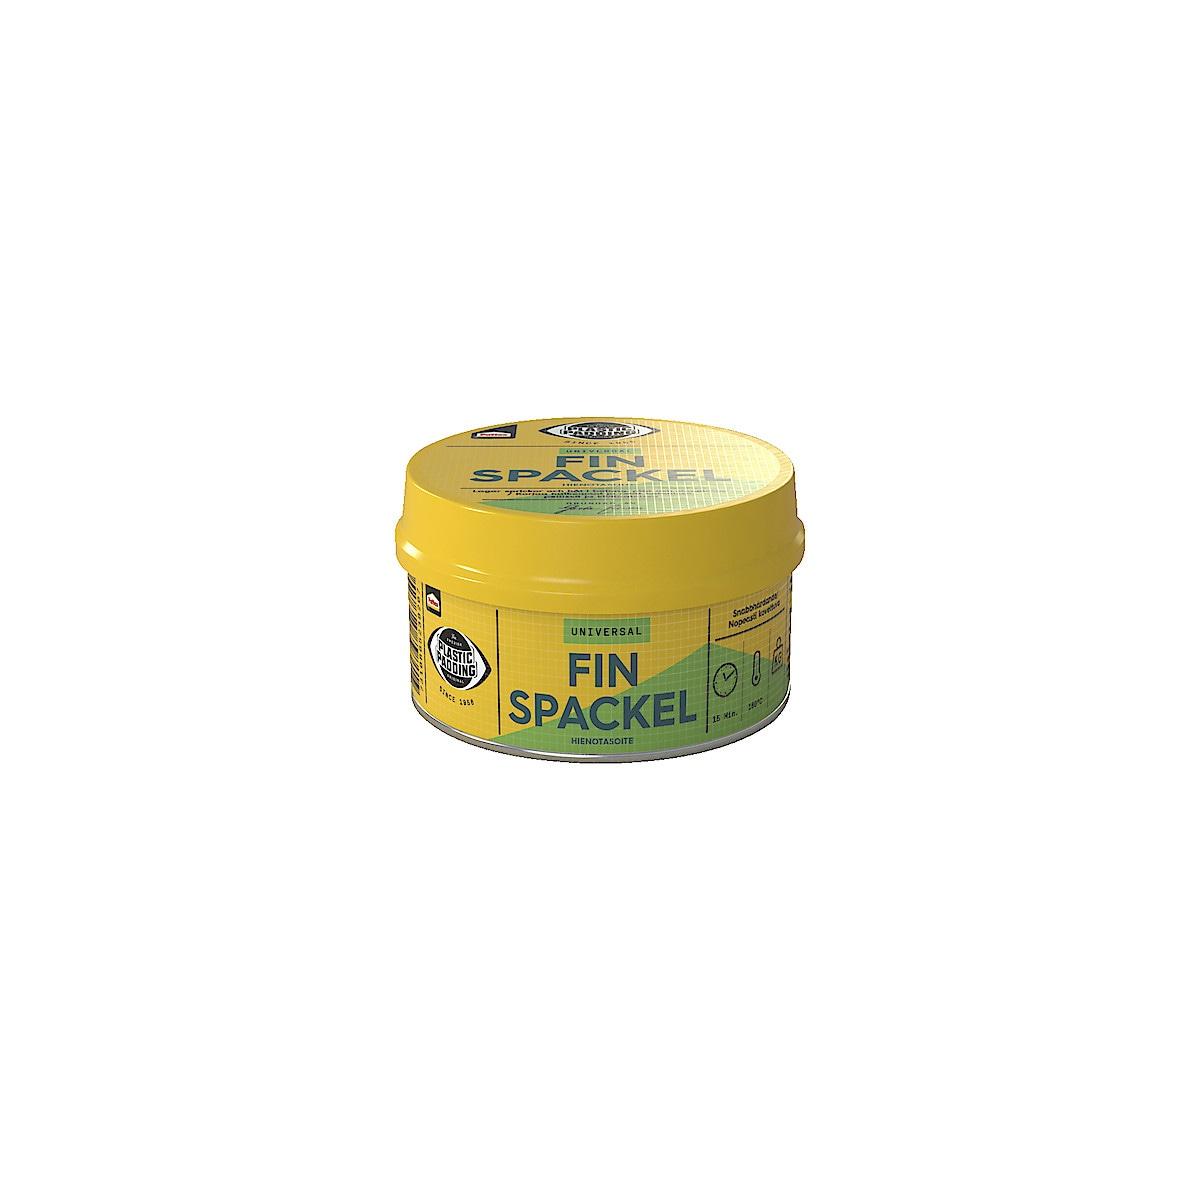 Finspackel Plastic Padding